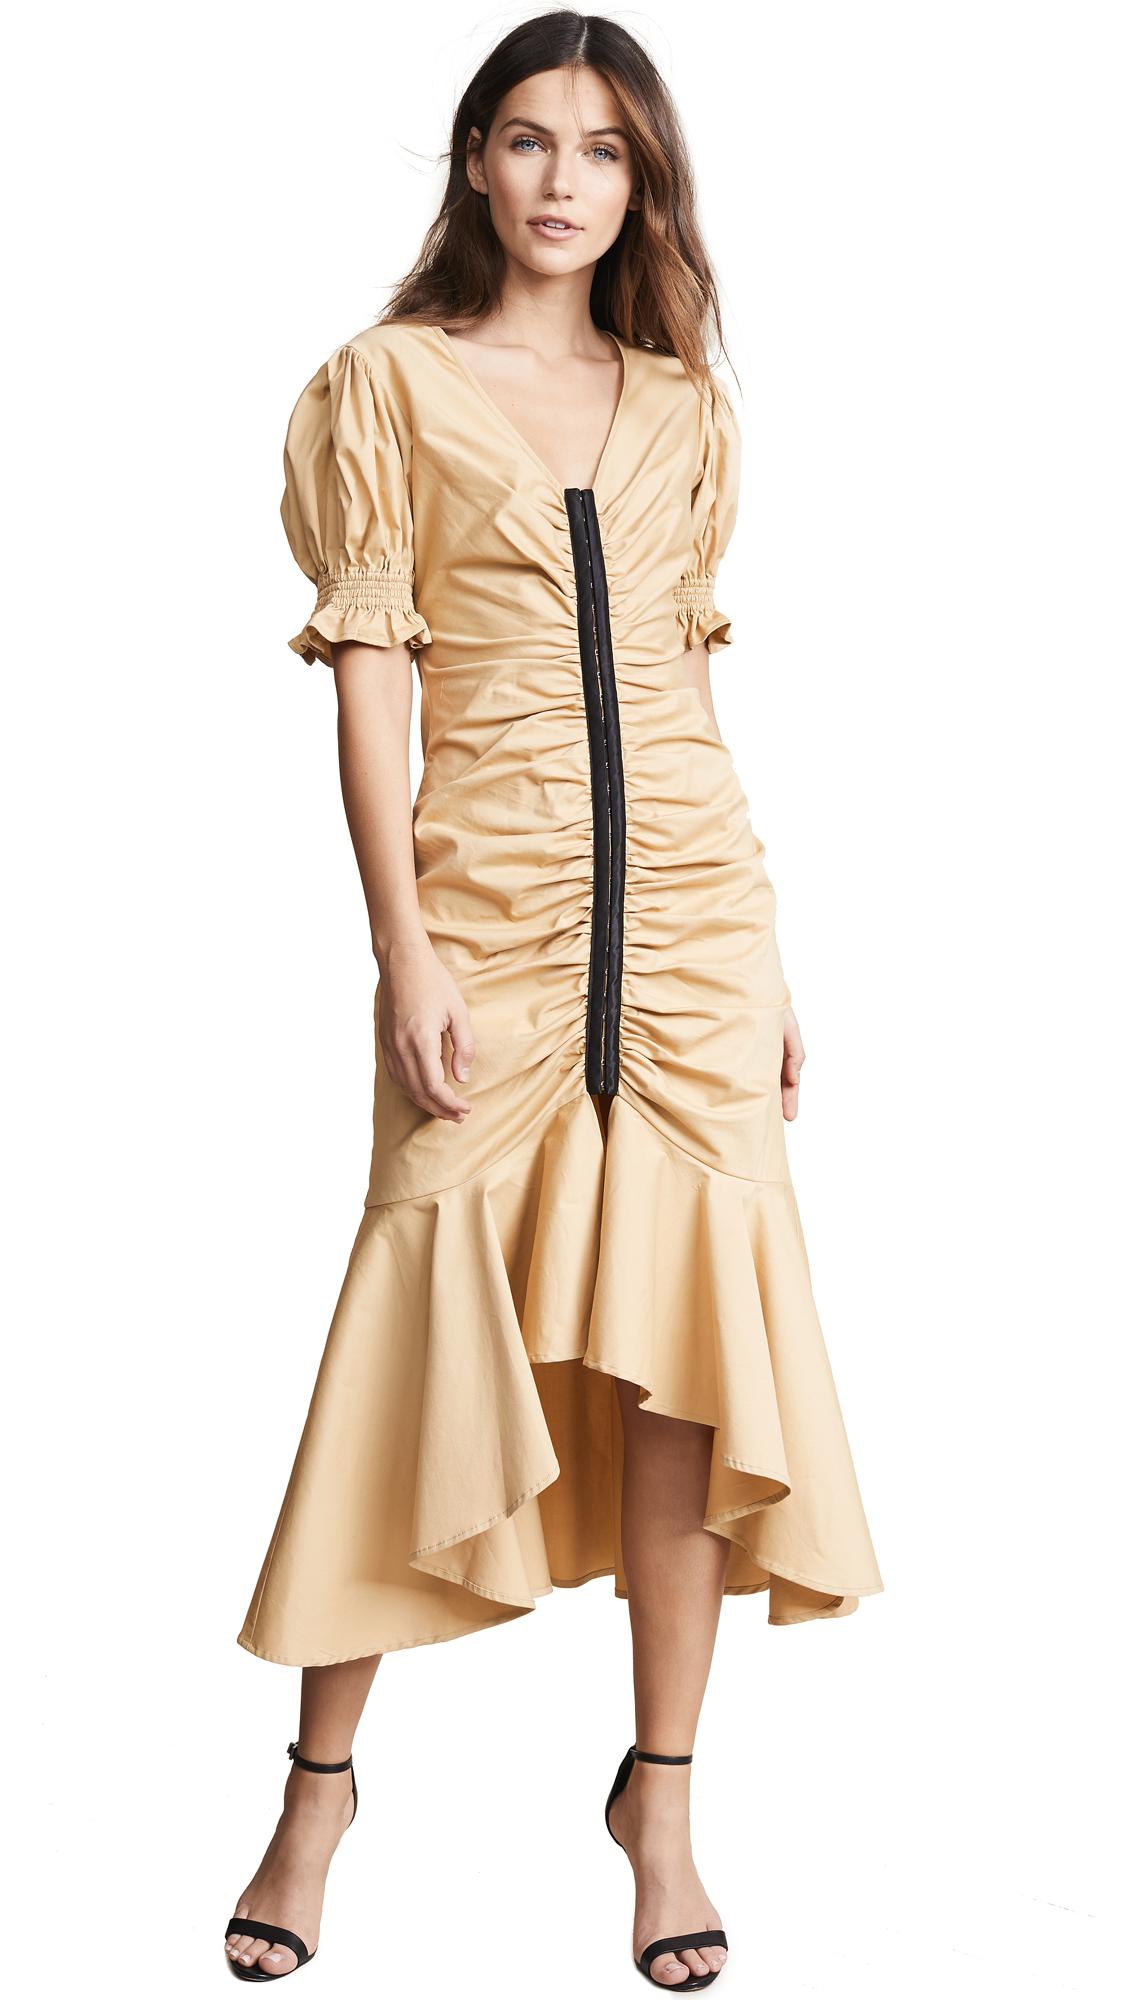 Imbue Midi Dress in Bone